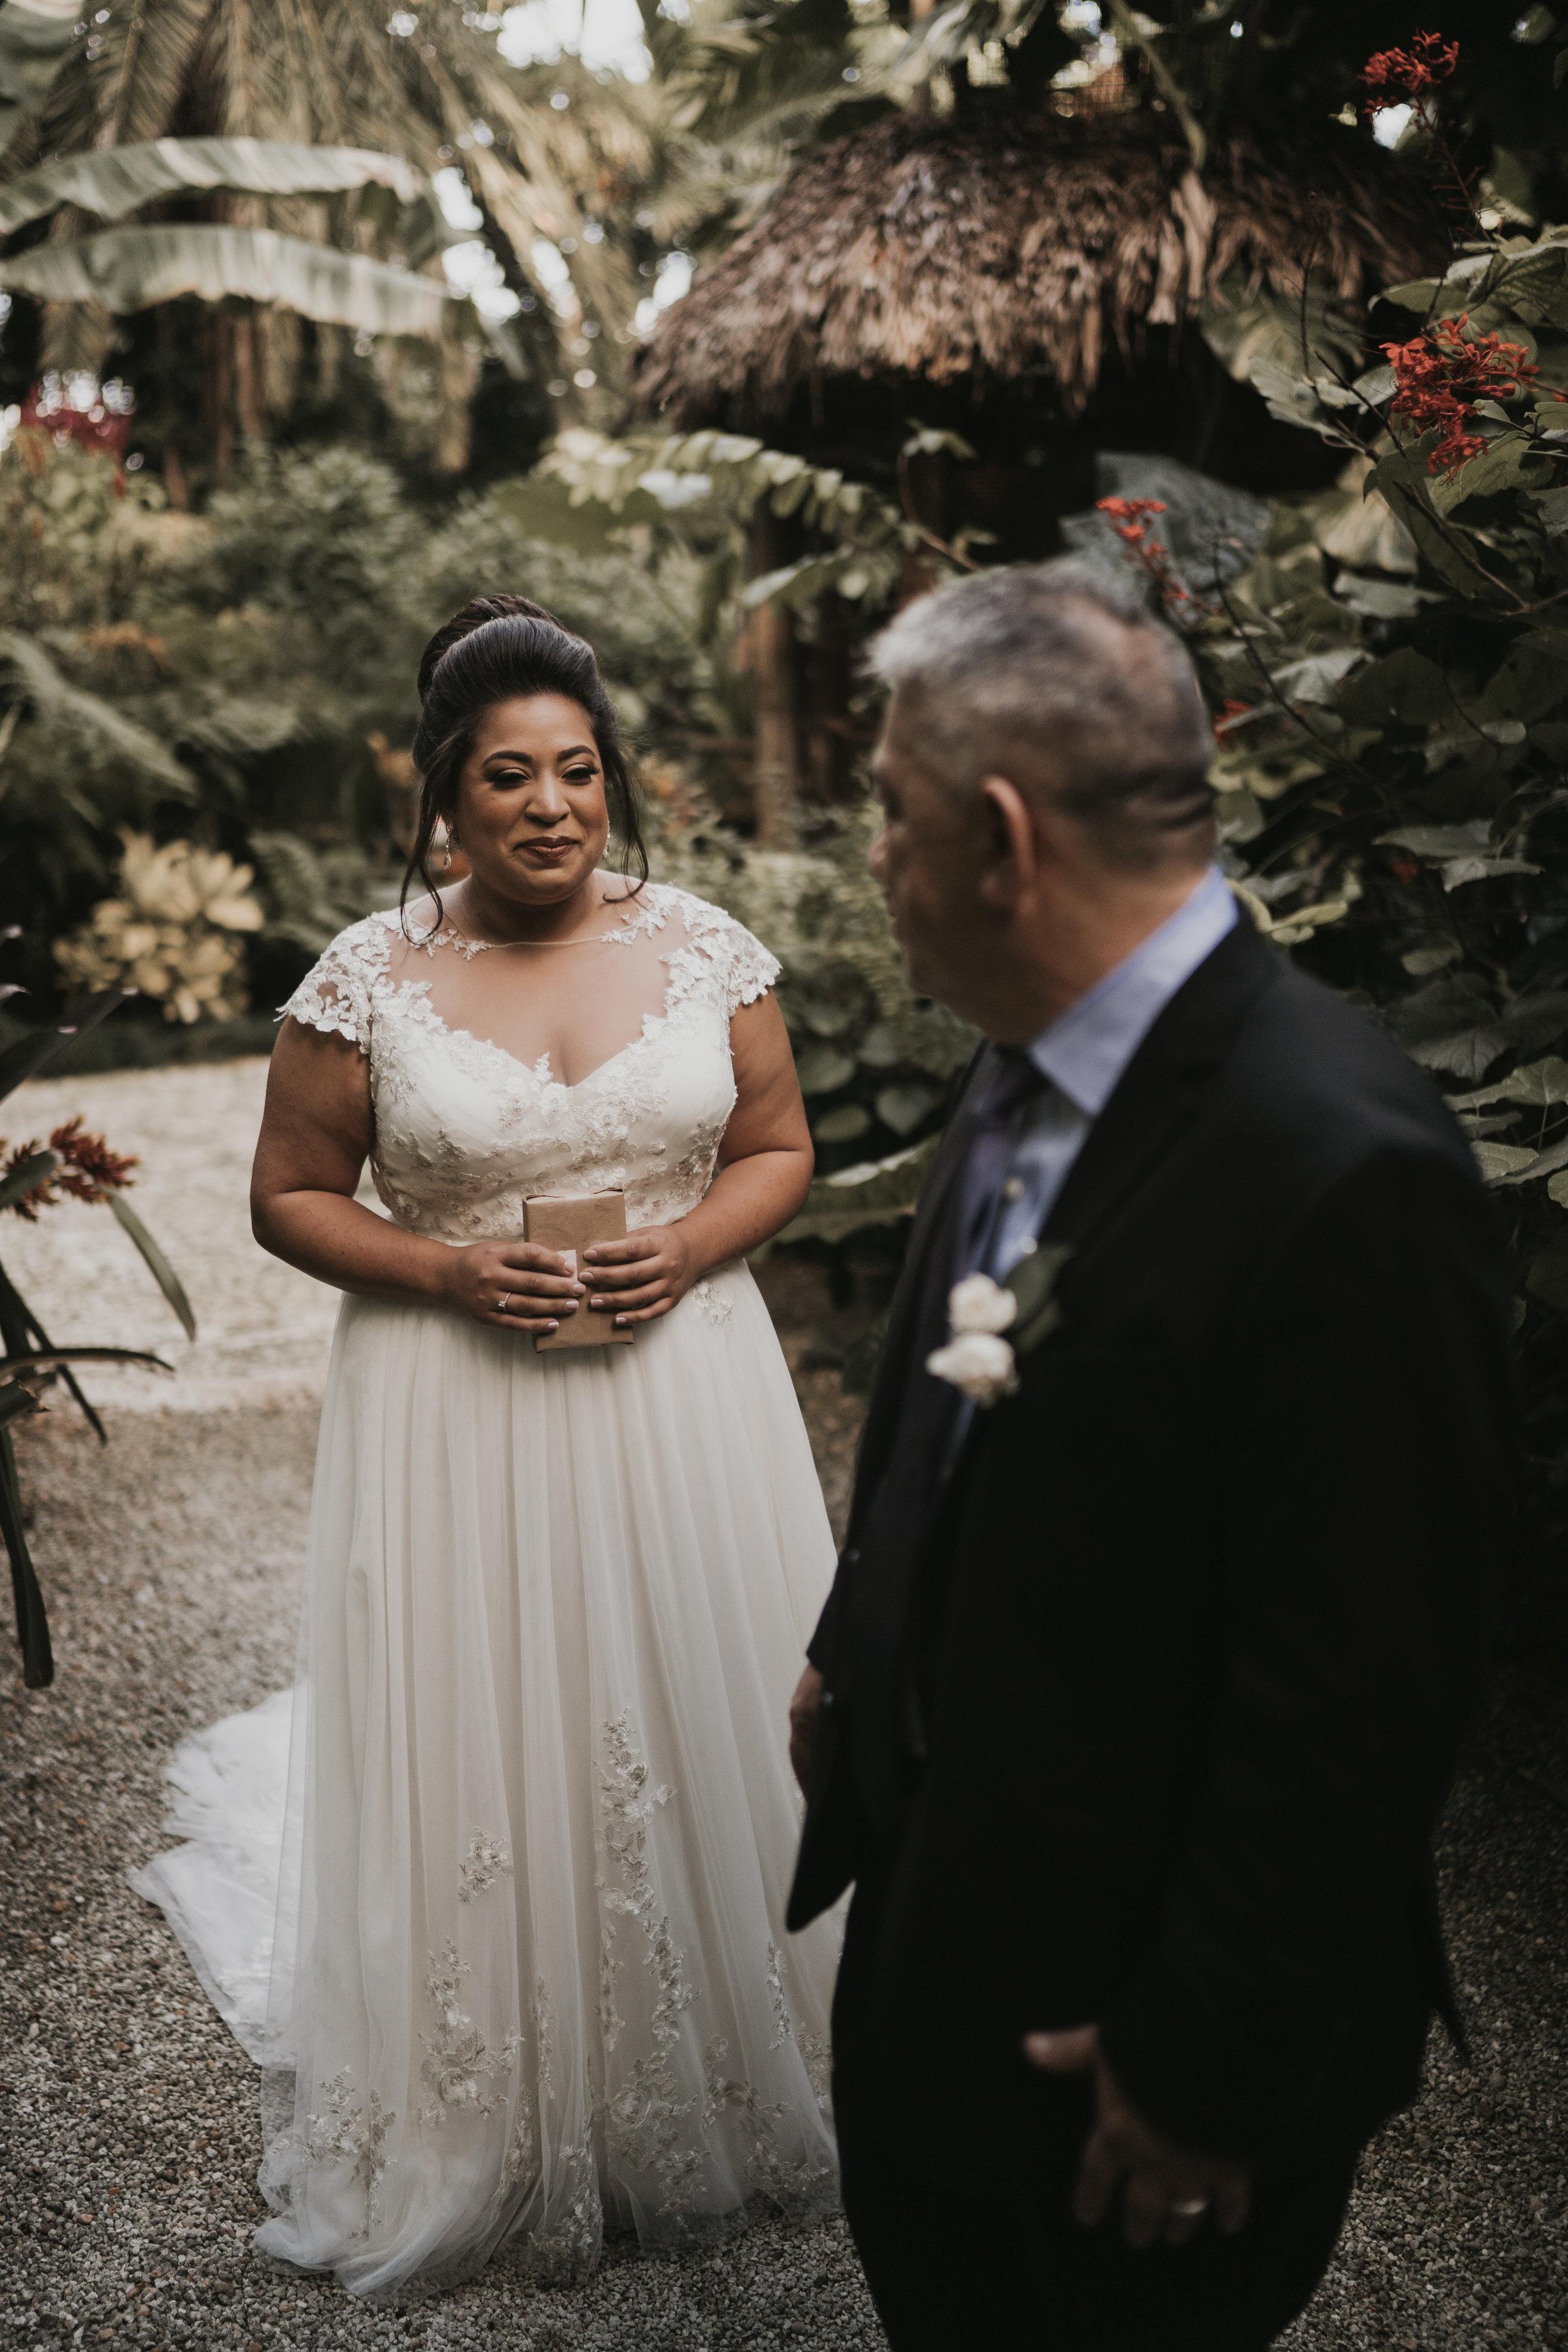 225MICHI&GABEWEDDINGDAY(WeddingFinal).jpg